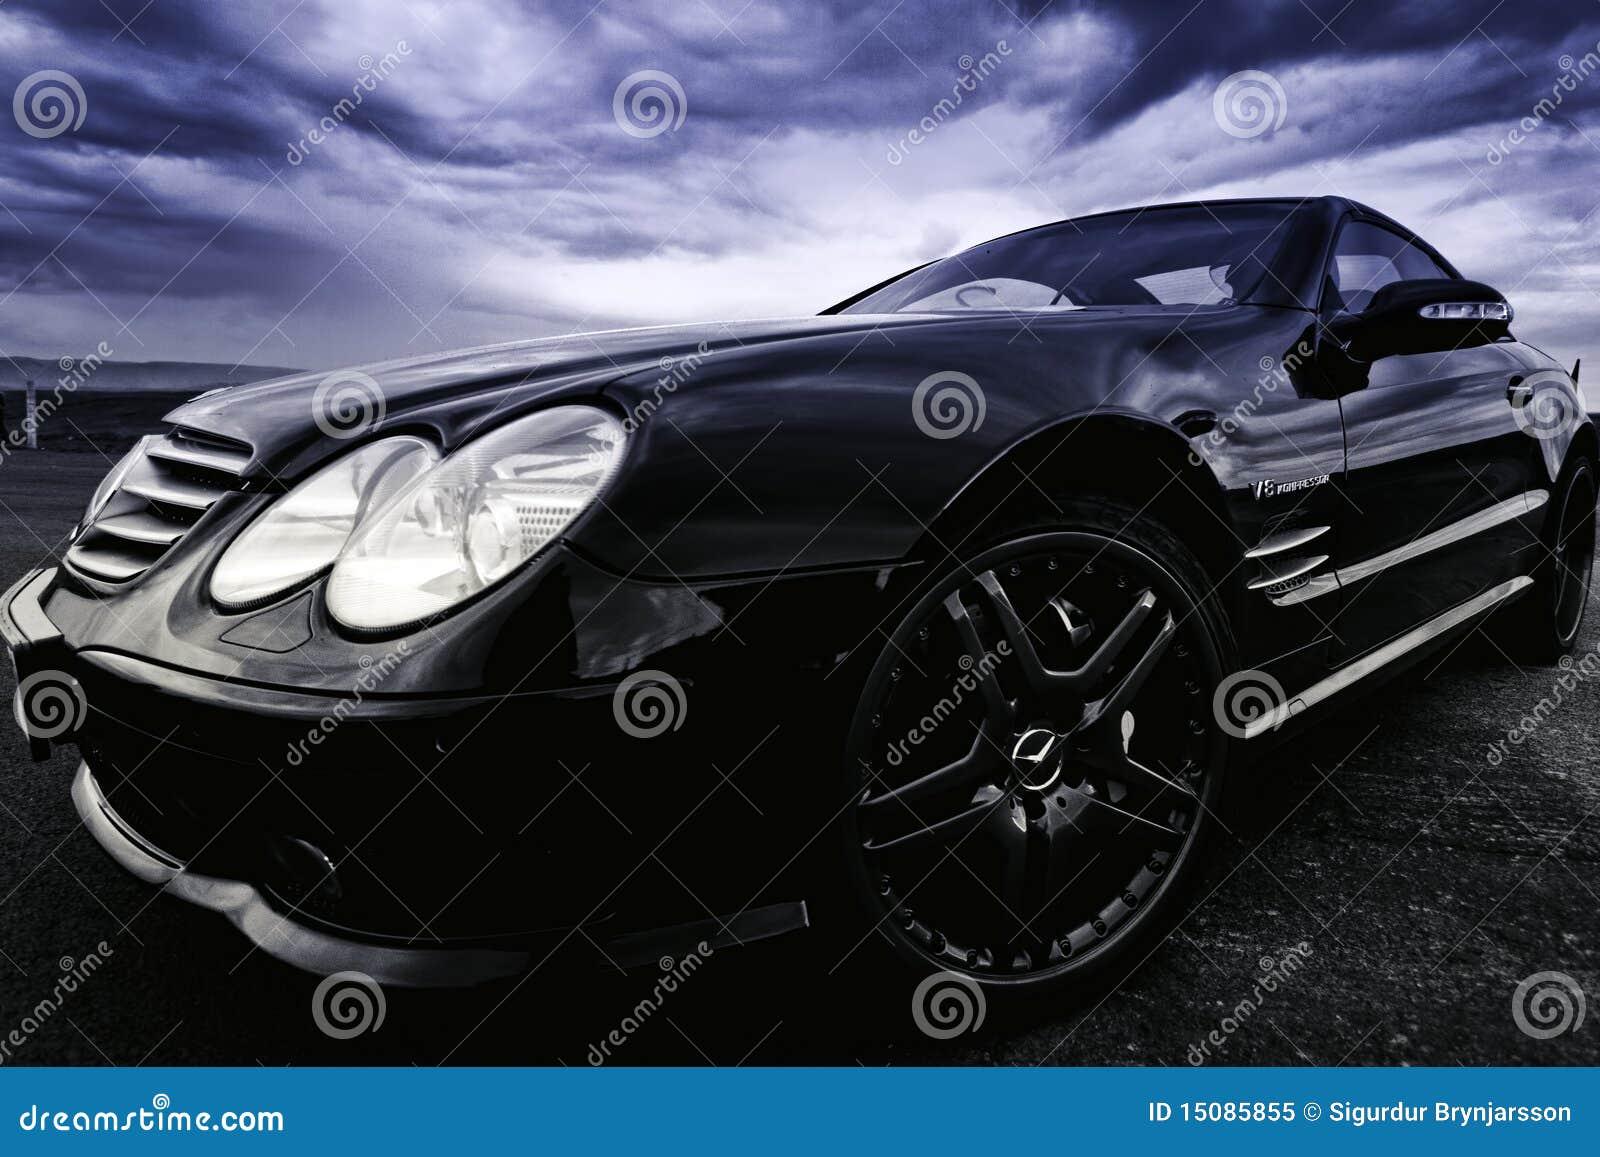 Drag Race, Mercedes Benz